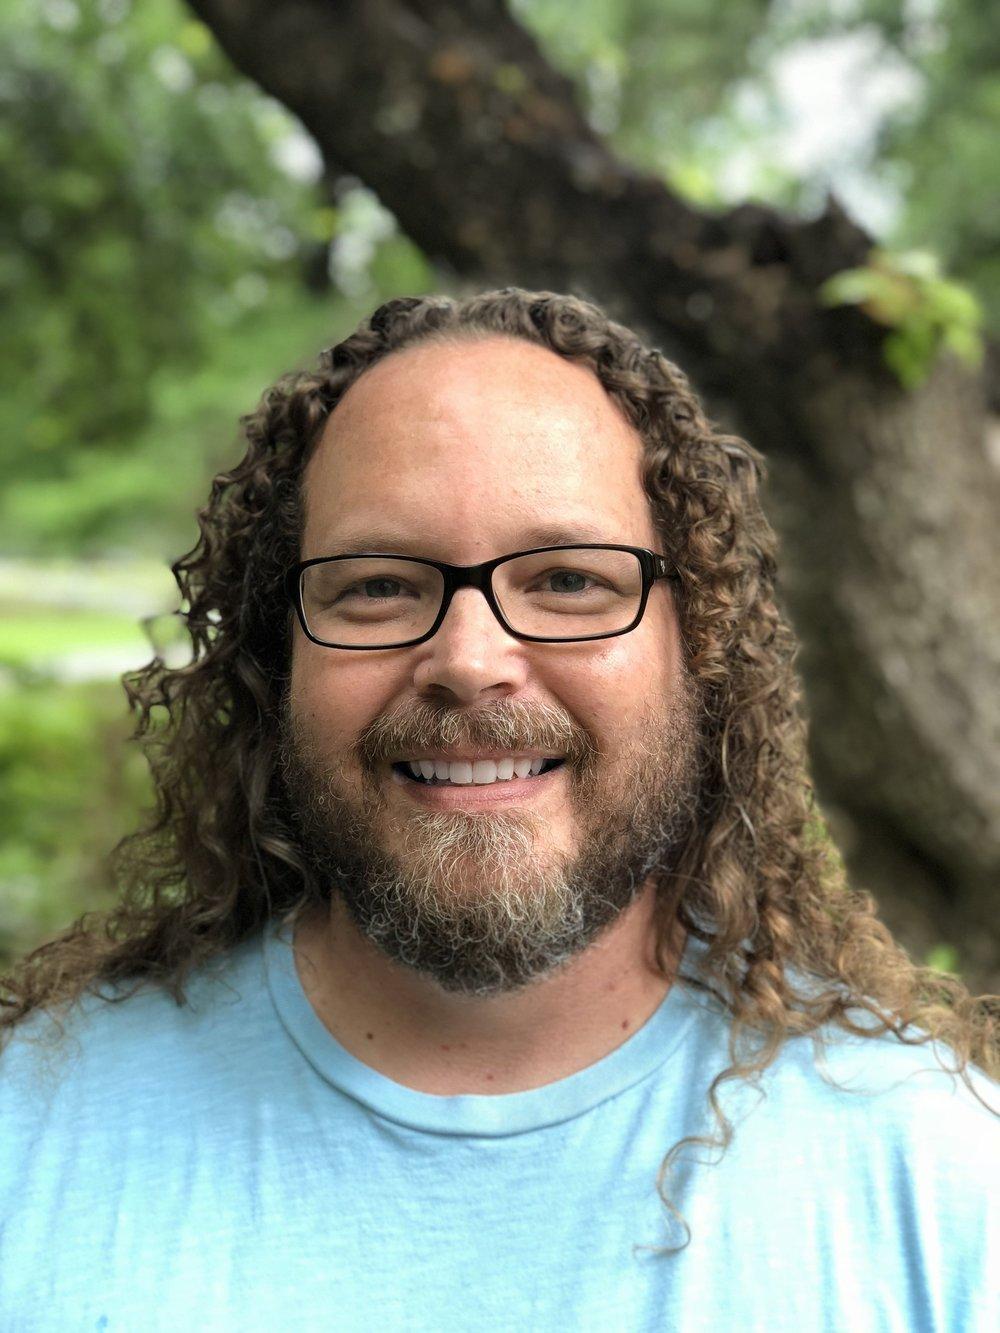 Josh Jertberg, Game Art & Animation Faculty